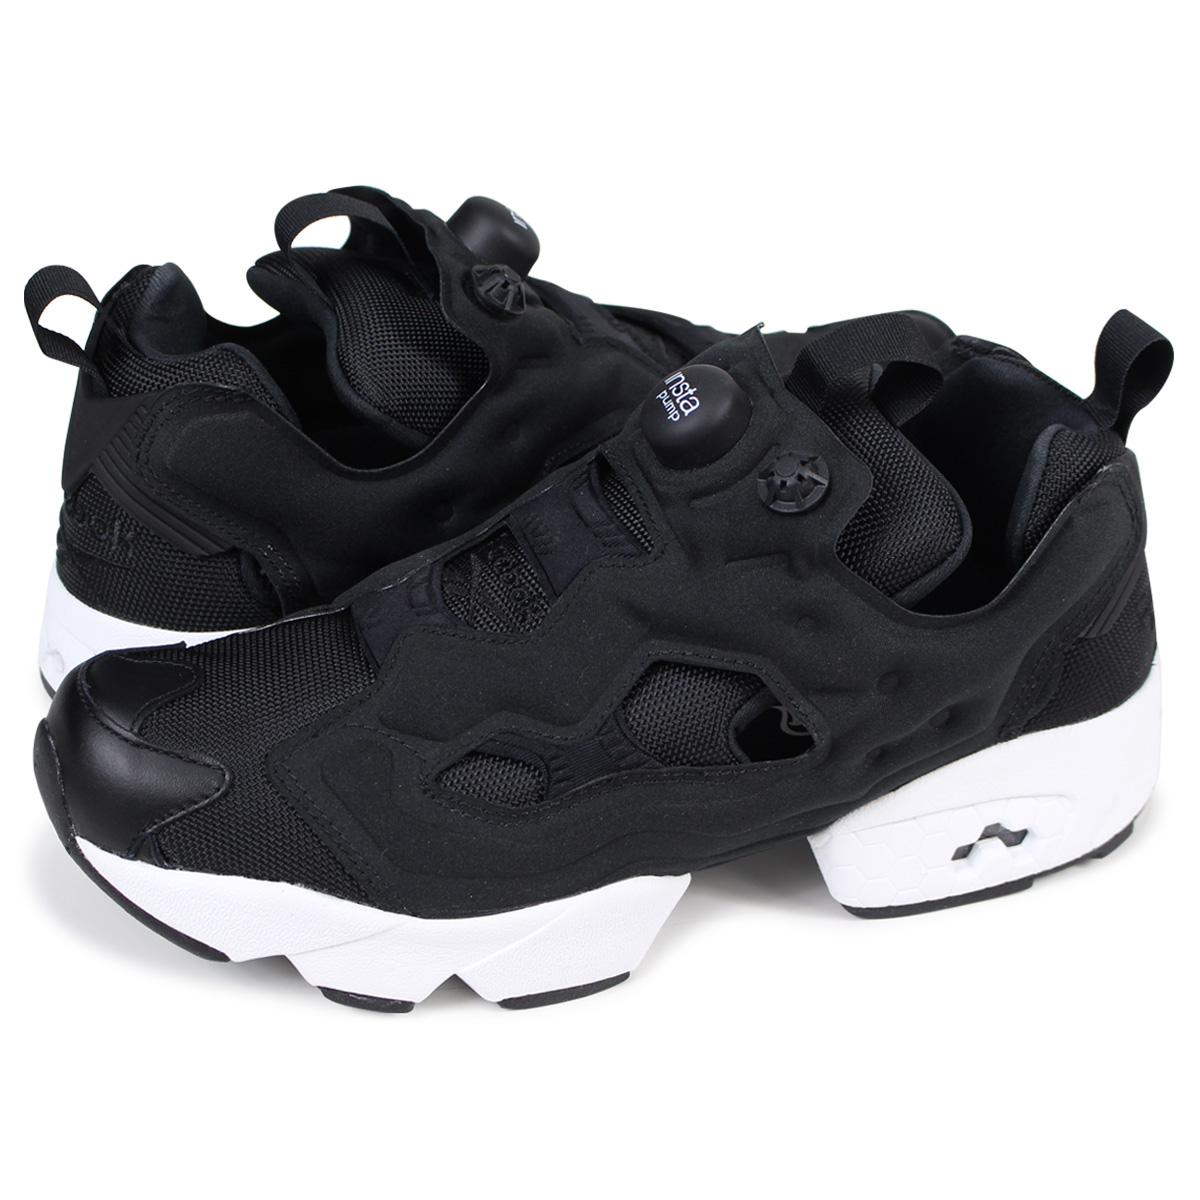 c002ea72fb8 Reebok Reebok pump fury sneakers INSTAPUMP FURY OG V65750 men s women s  shoes black